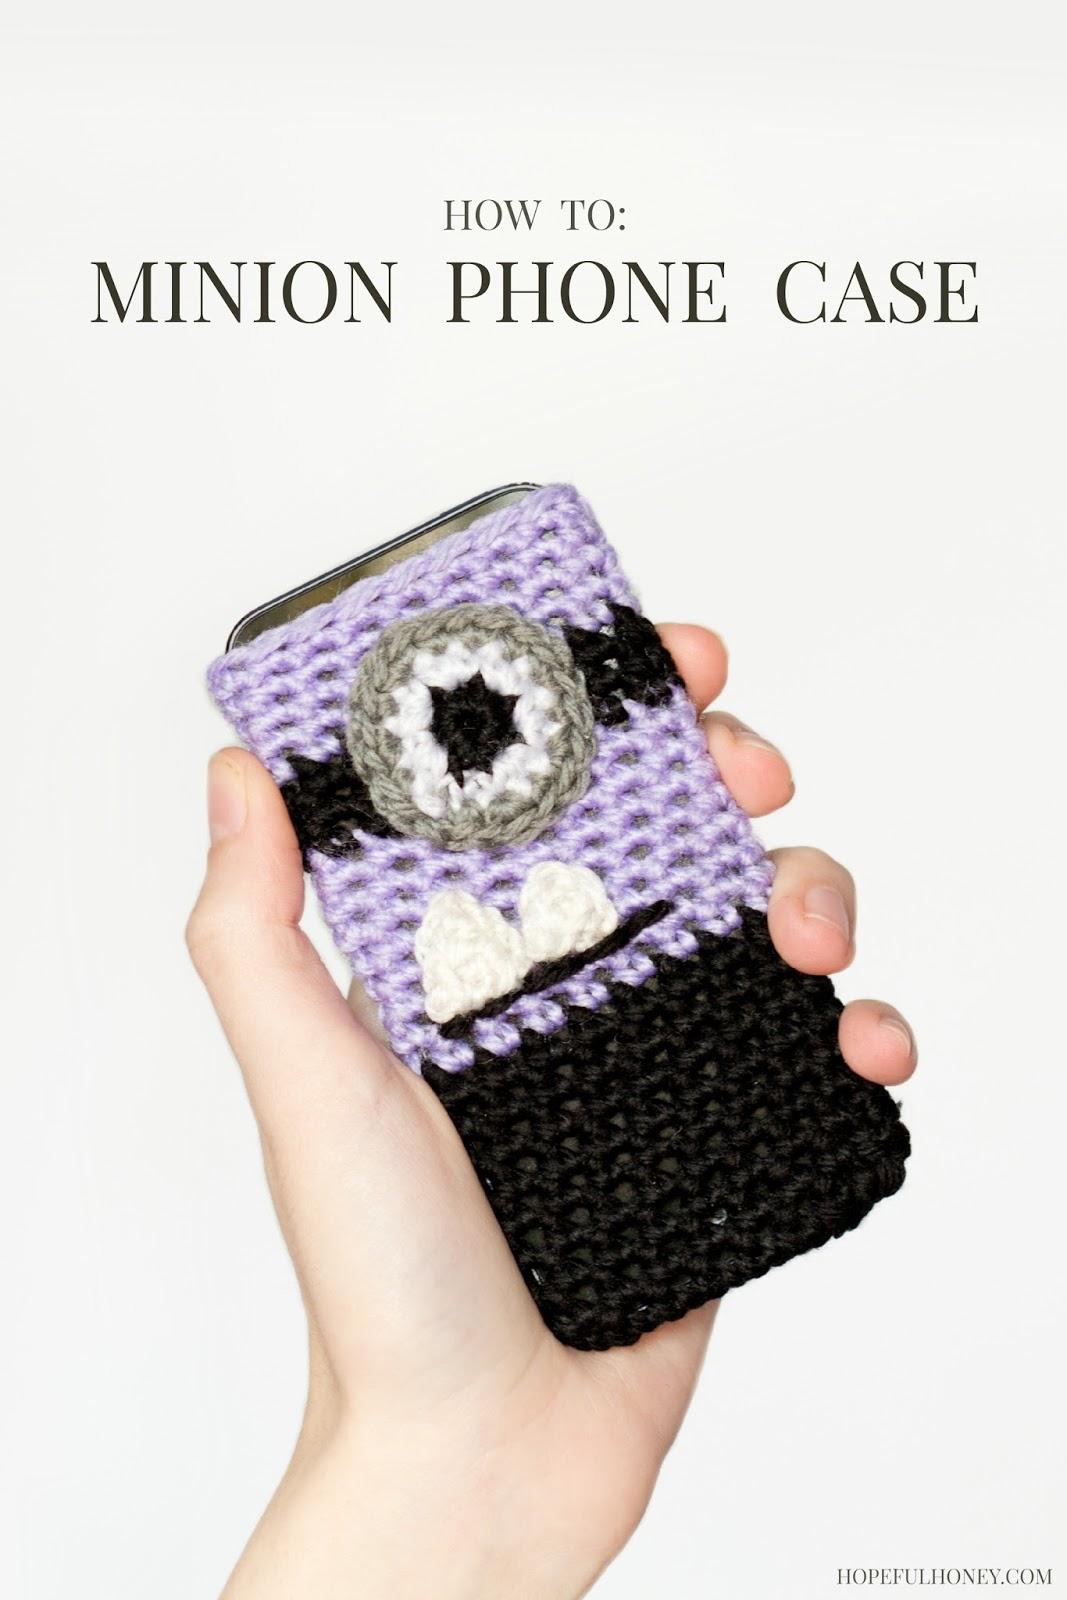 http://4.bp.blogspot.com/-veV45aVDljA/U7facywMCeI/AAAAAAAALyk/xVVmpNiT8bw/s1600/Evil+Minion+Inspired+Phone+Case+Crochet+Pattern+1.jpg